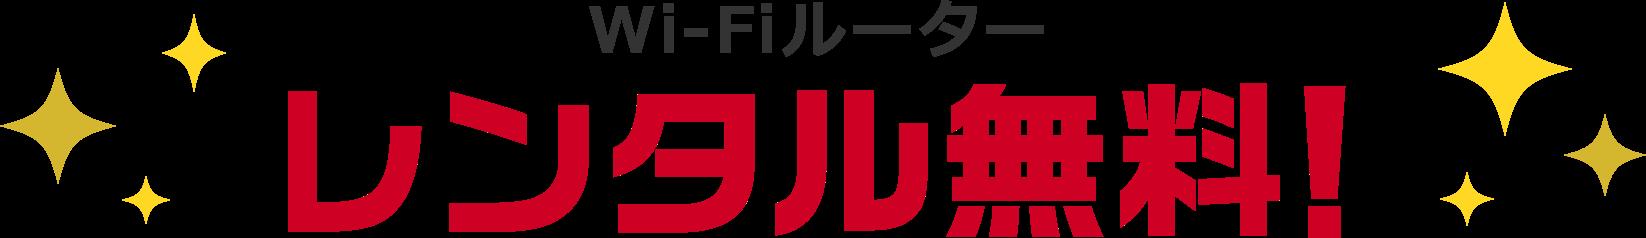 Wi-Fiルーターレンタル無料!